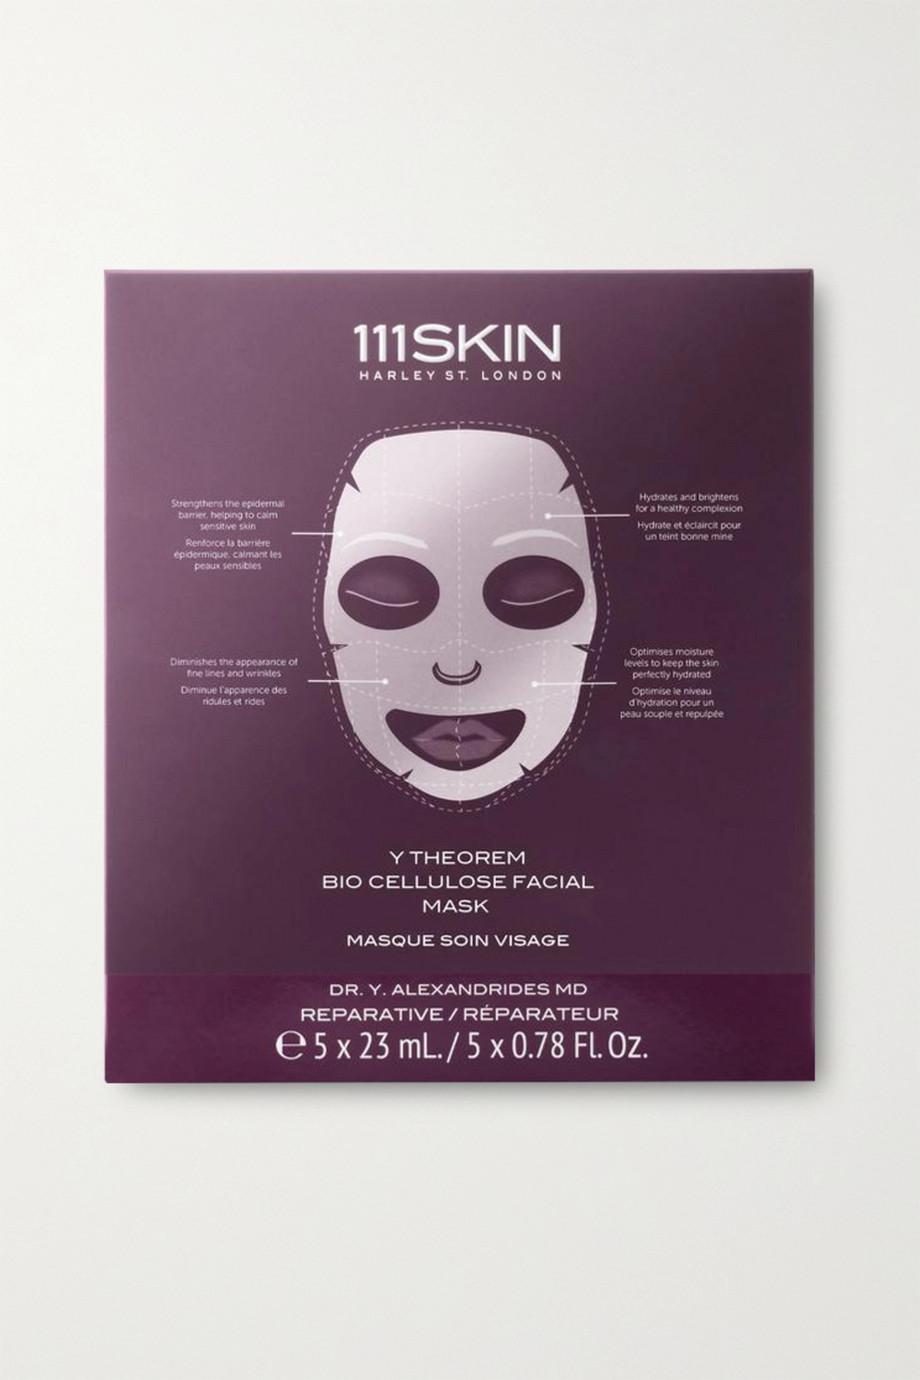 111SKIN Y Theorem Bio Cellulose Facial Mask, 5 x 23ml